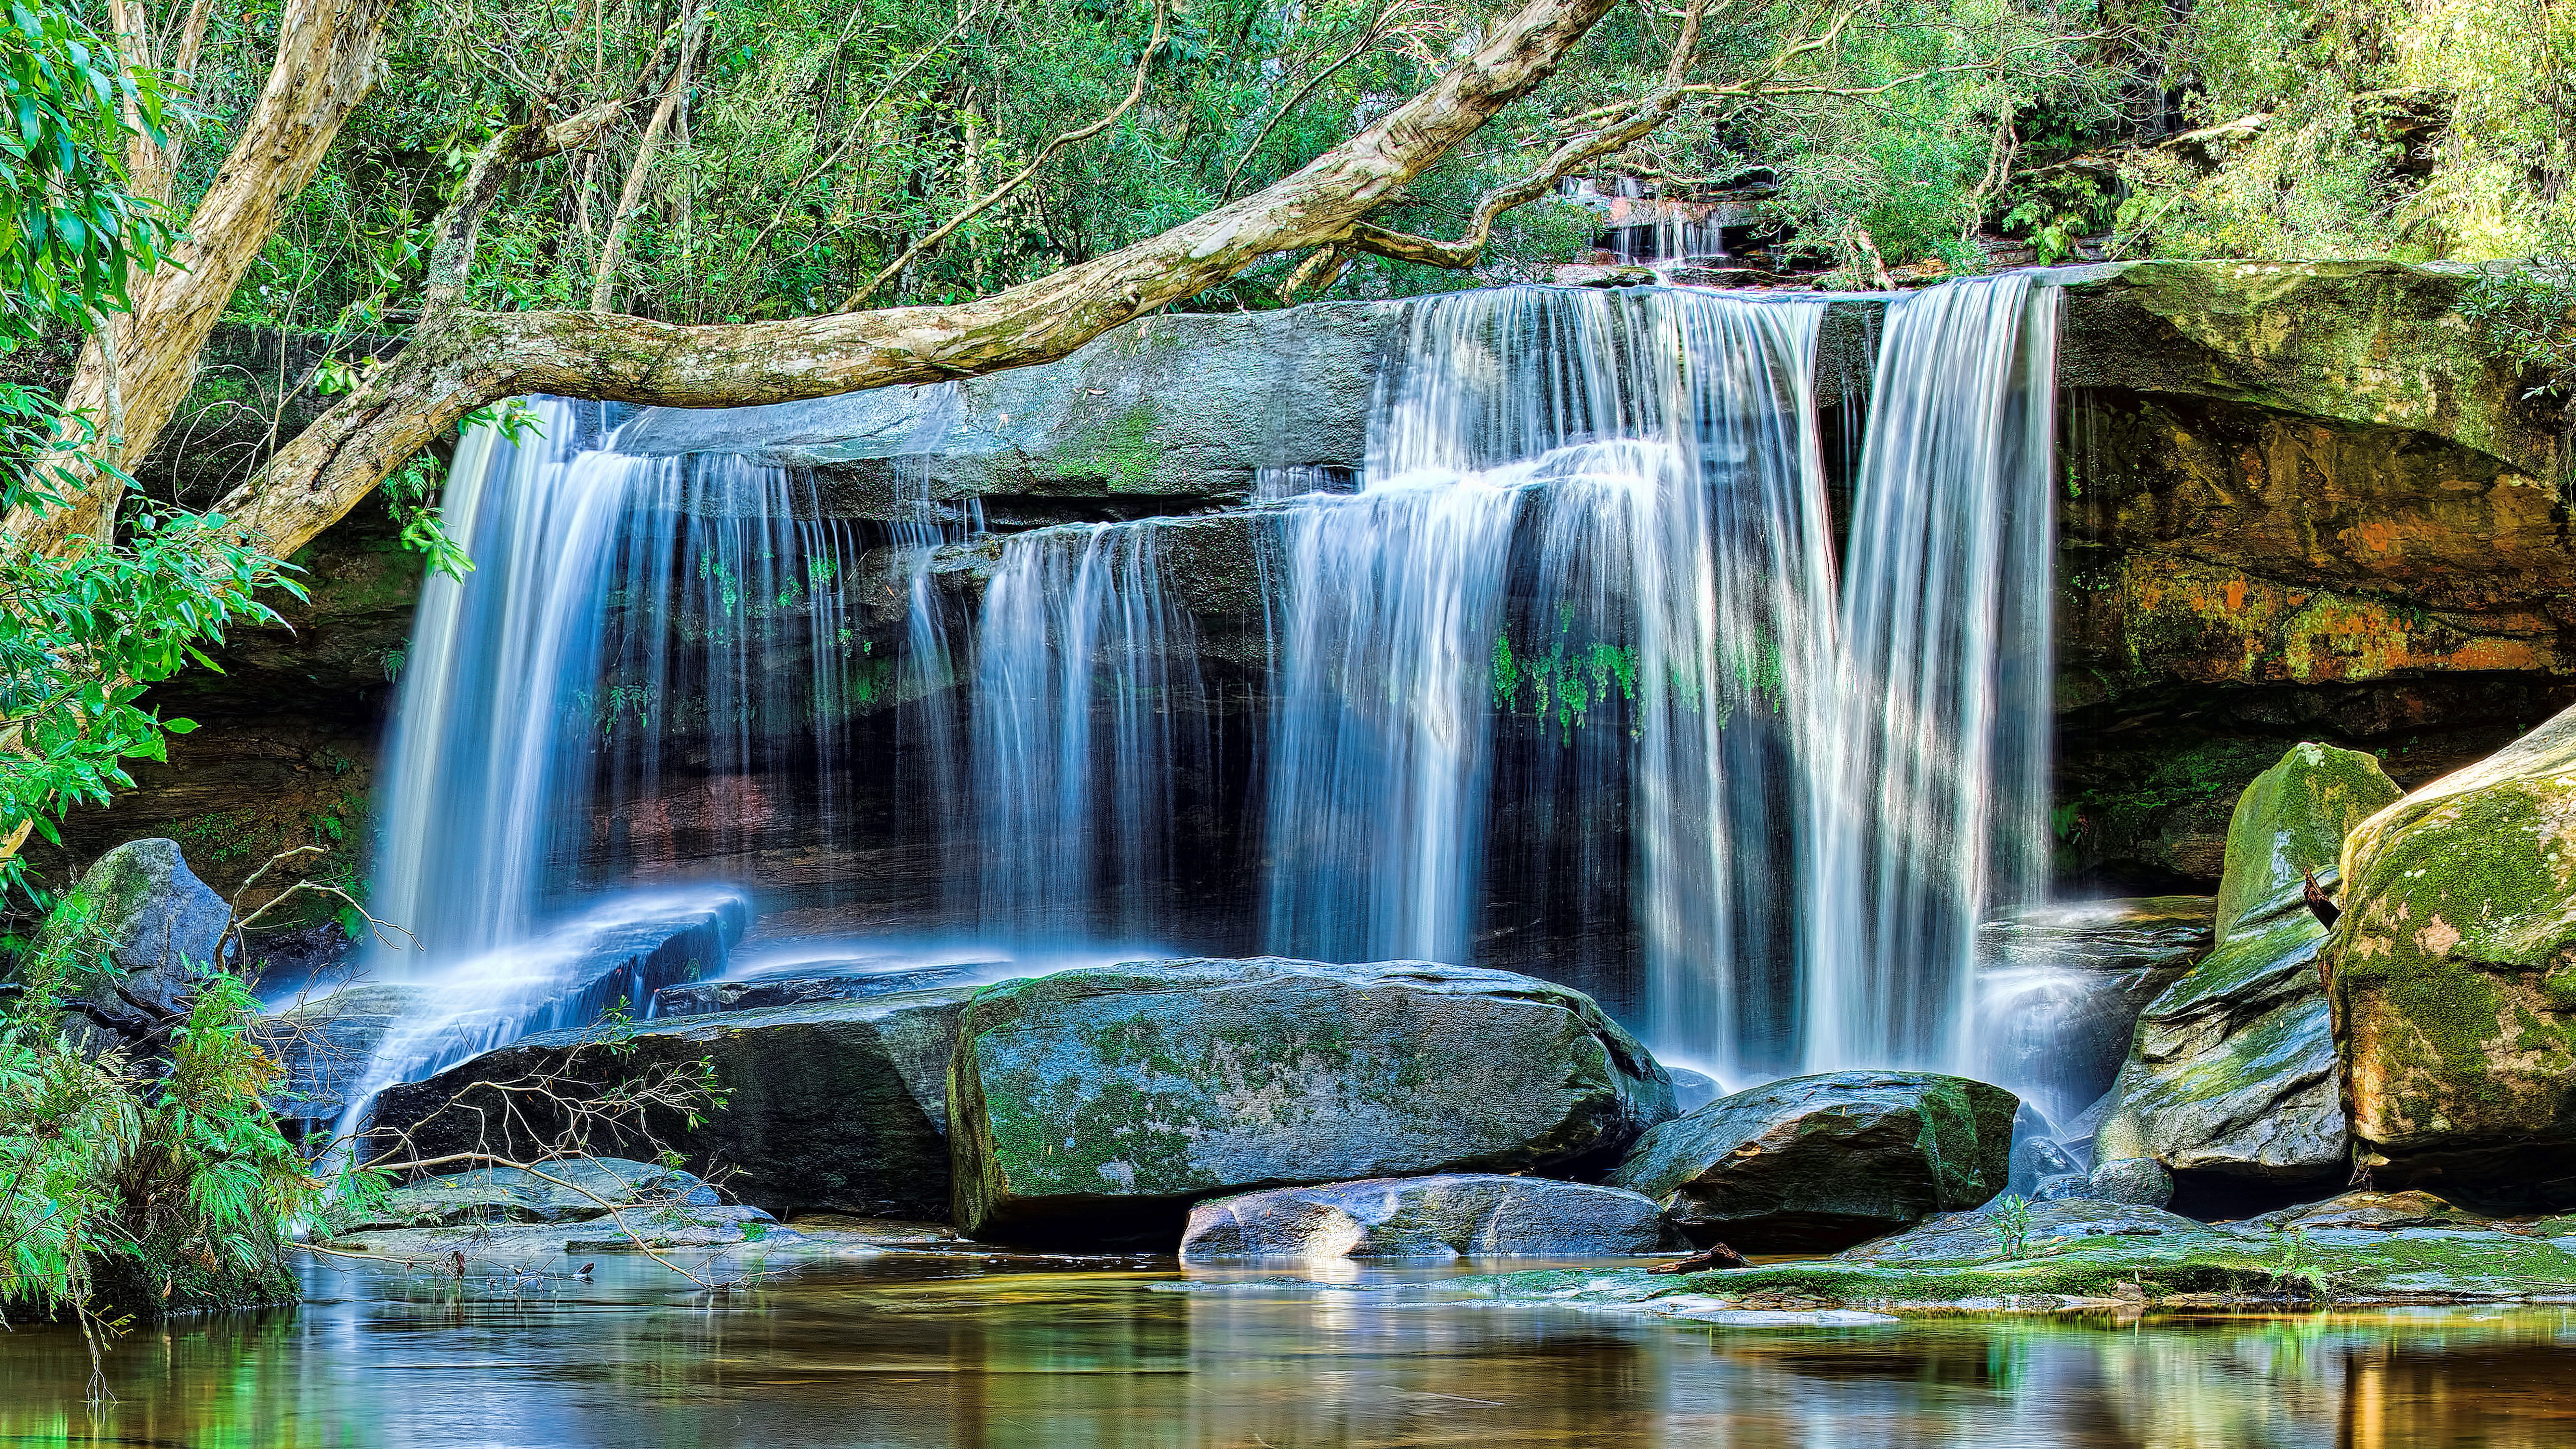 8k ultra hd nature waterfall wallpaper hd nature